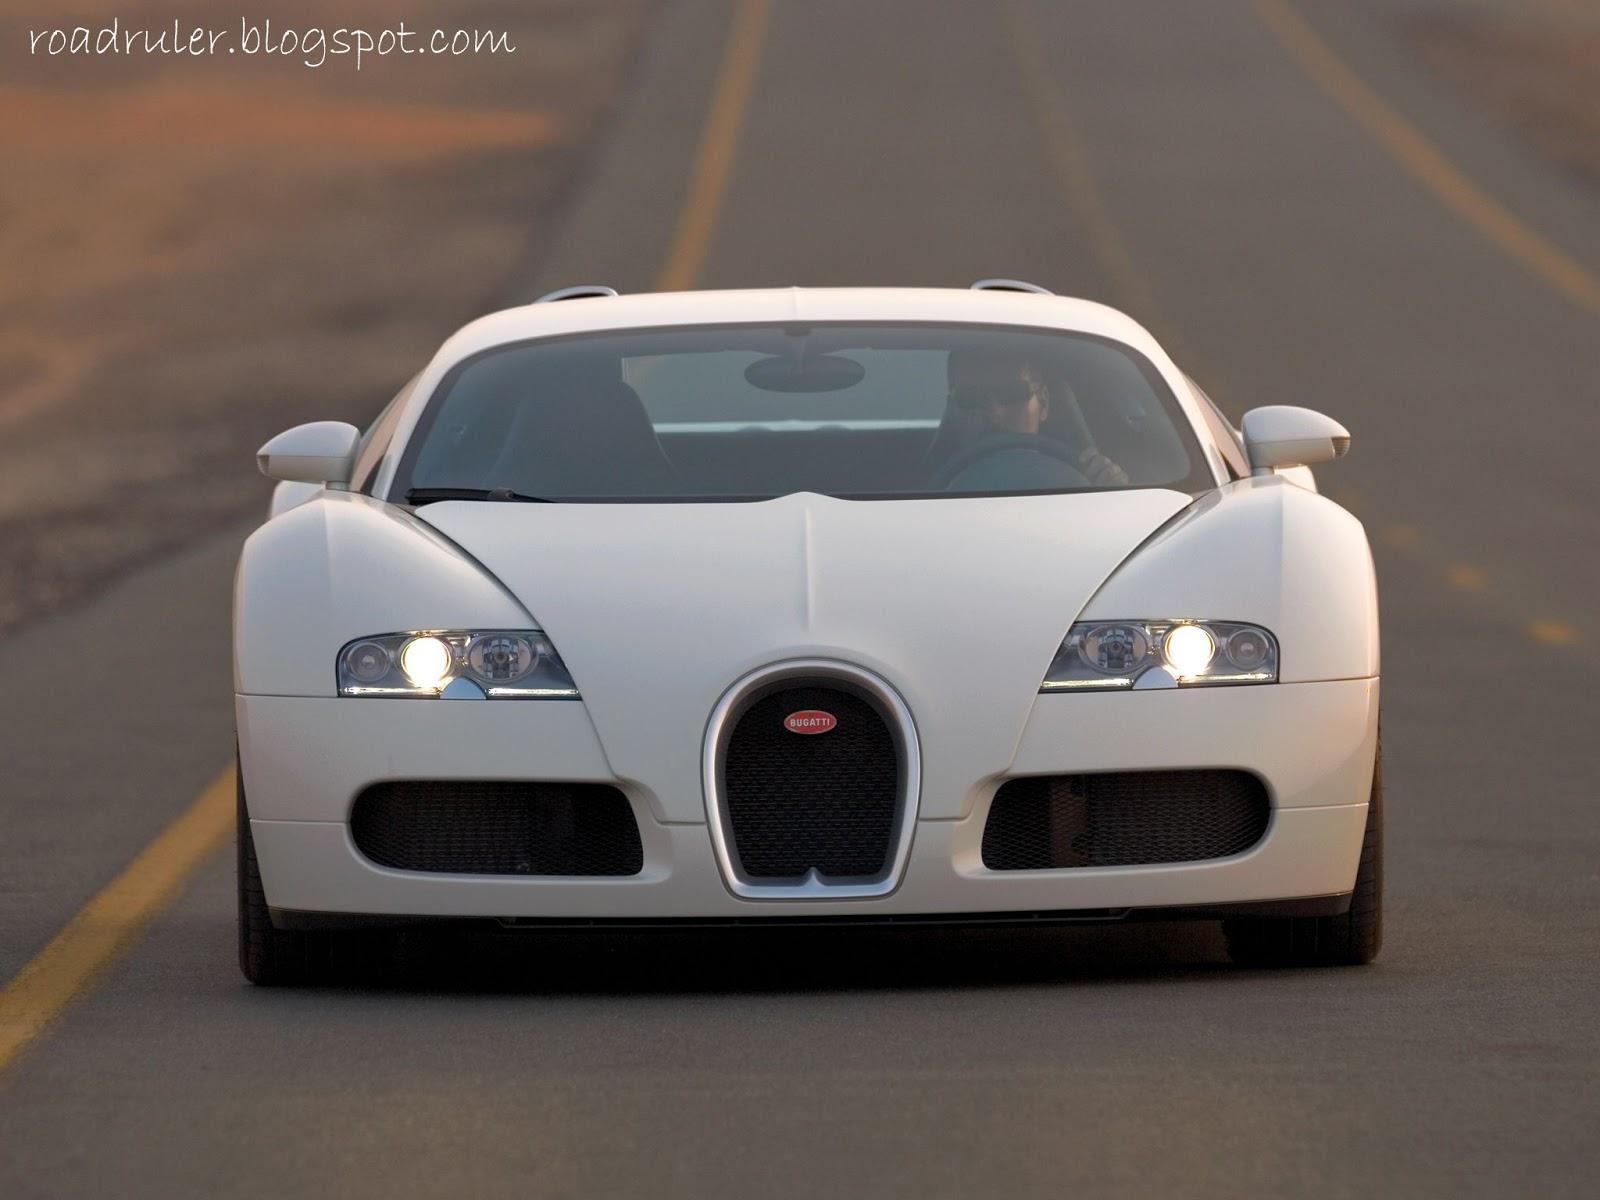 bugatti_veyron_1st_coupe2d-608 Inspiring Bugatti Veyron Quarter Mile Speed Cars Trend